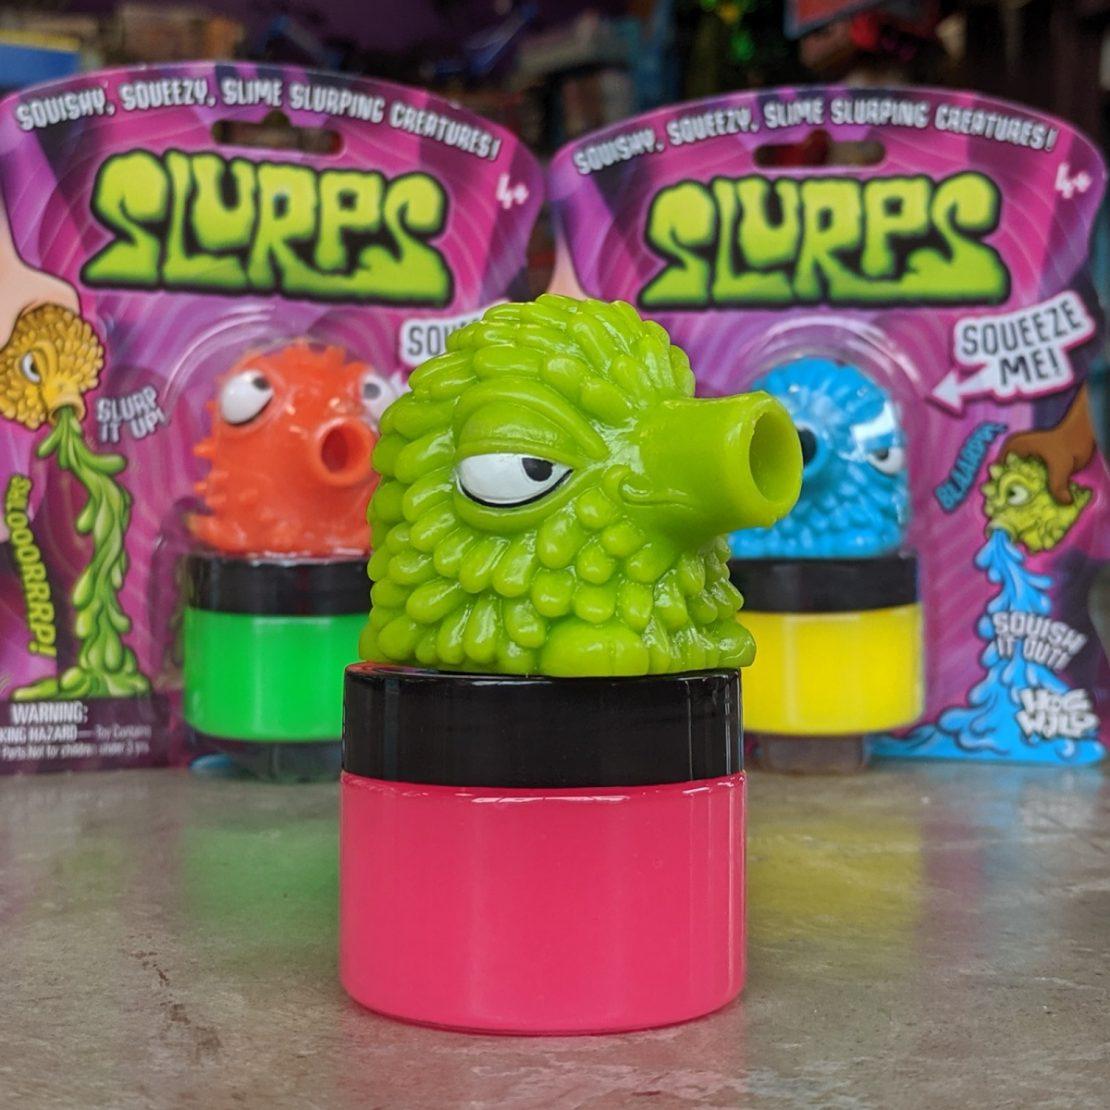 Slurps creature and slime from Hog Wild